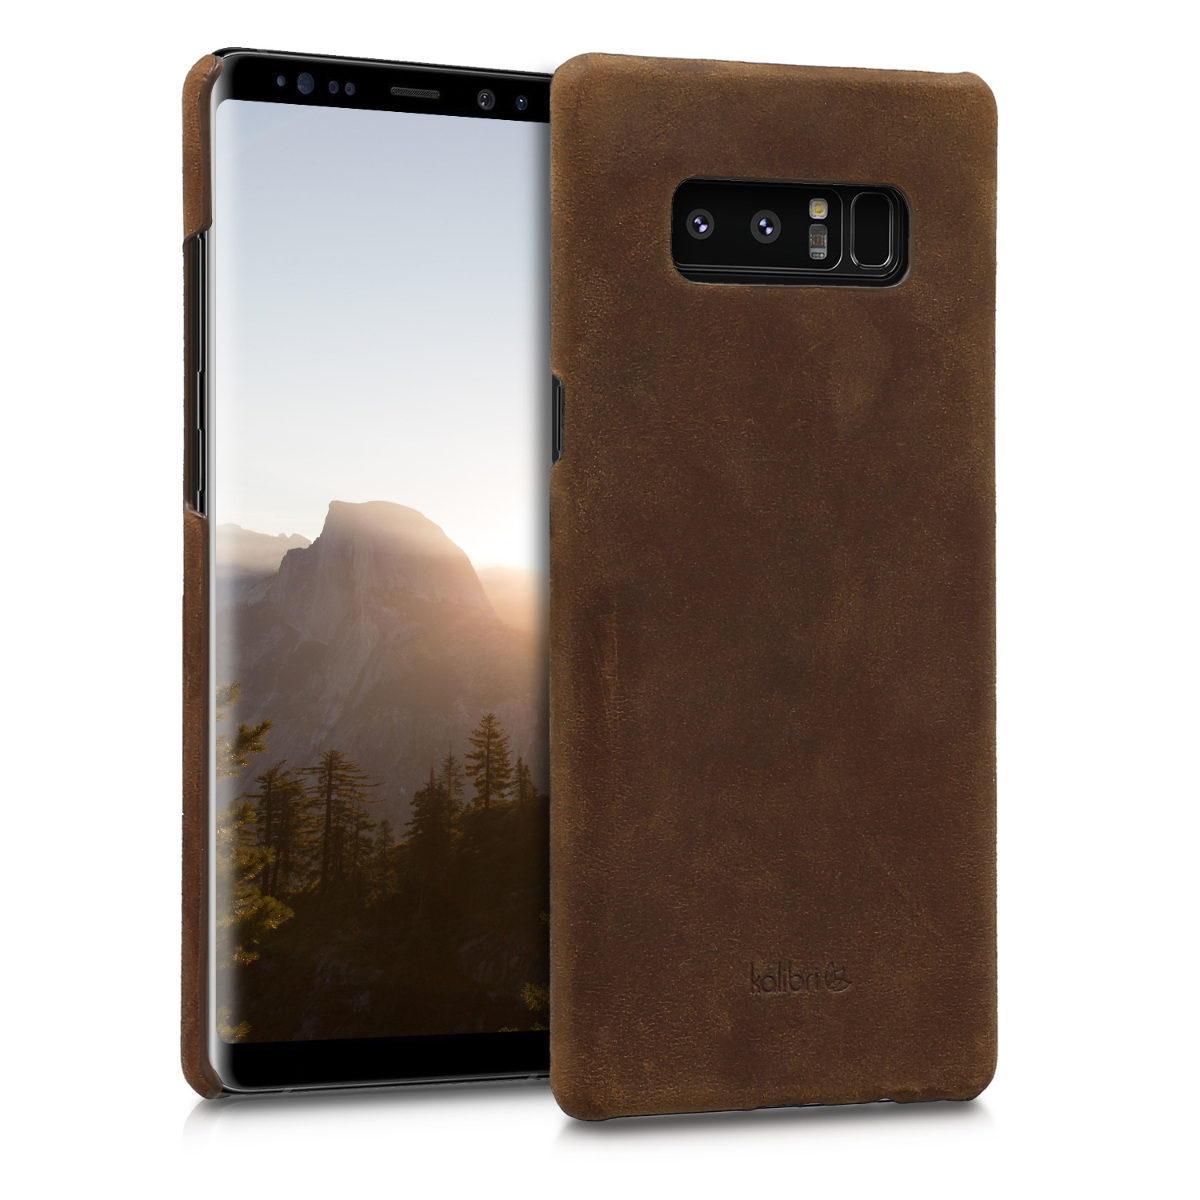 Kalibri Σκληρή Δερμάτινη Θήκη Samsung Galaxy Note 8 - Brown (43335.05)